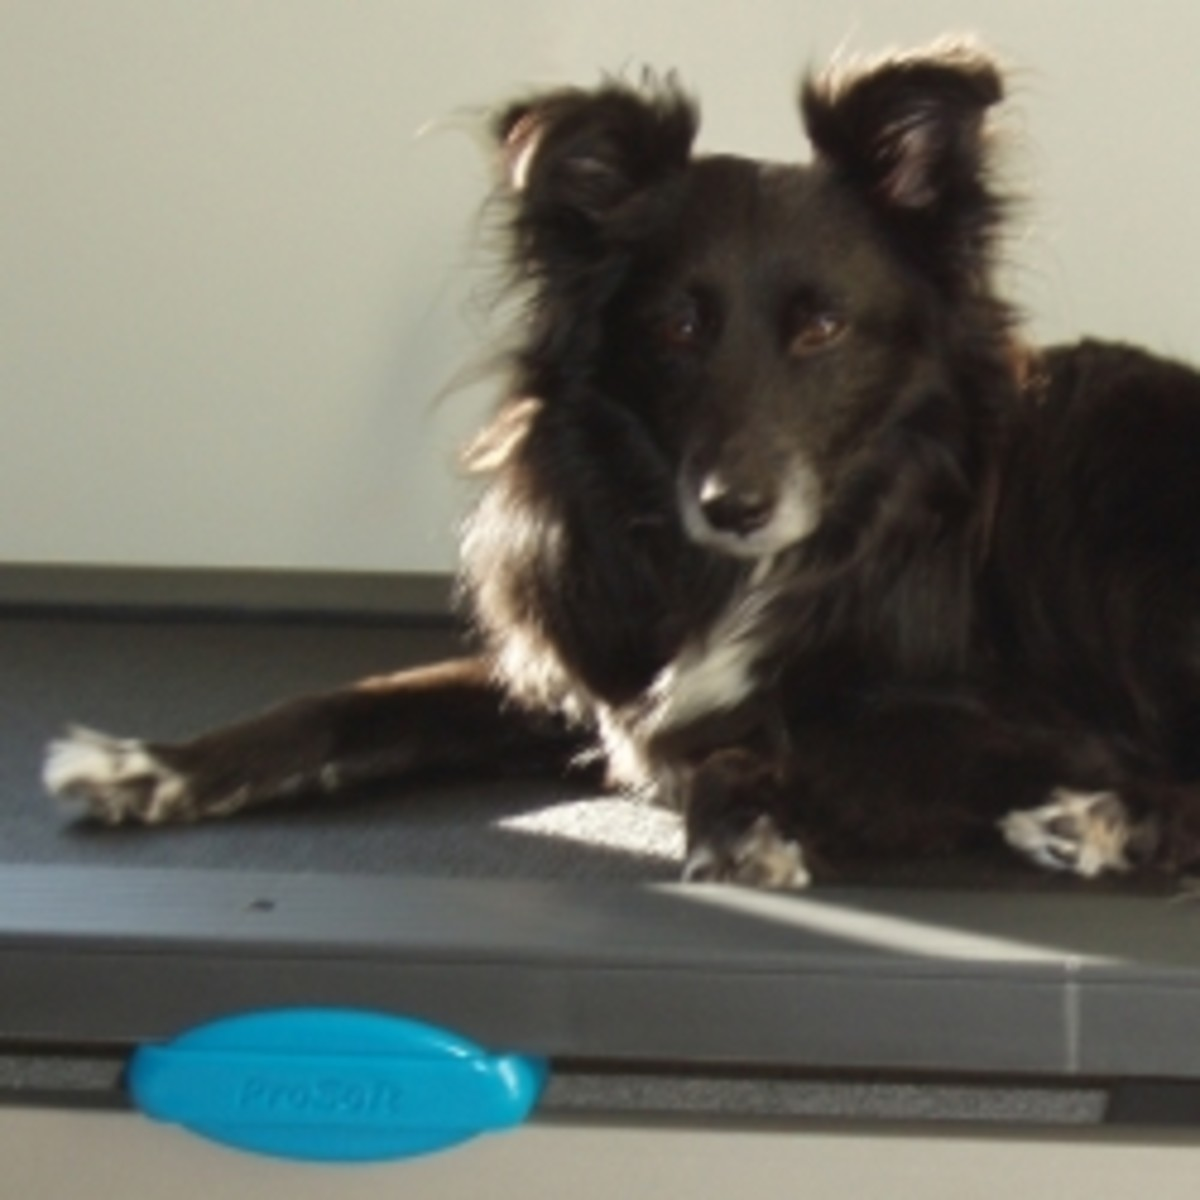 Relaxing between laps on Mum's treadmill.